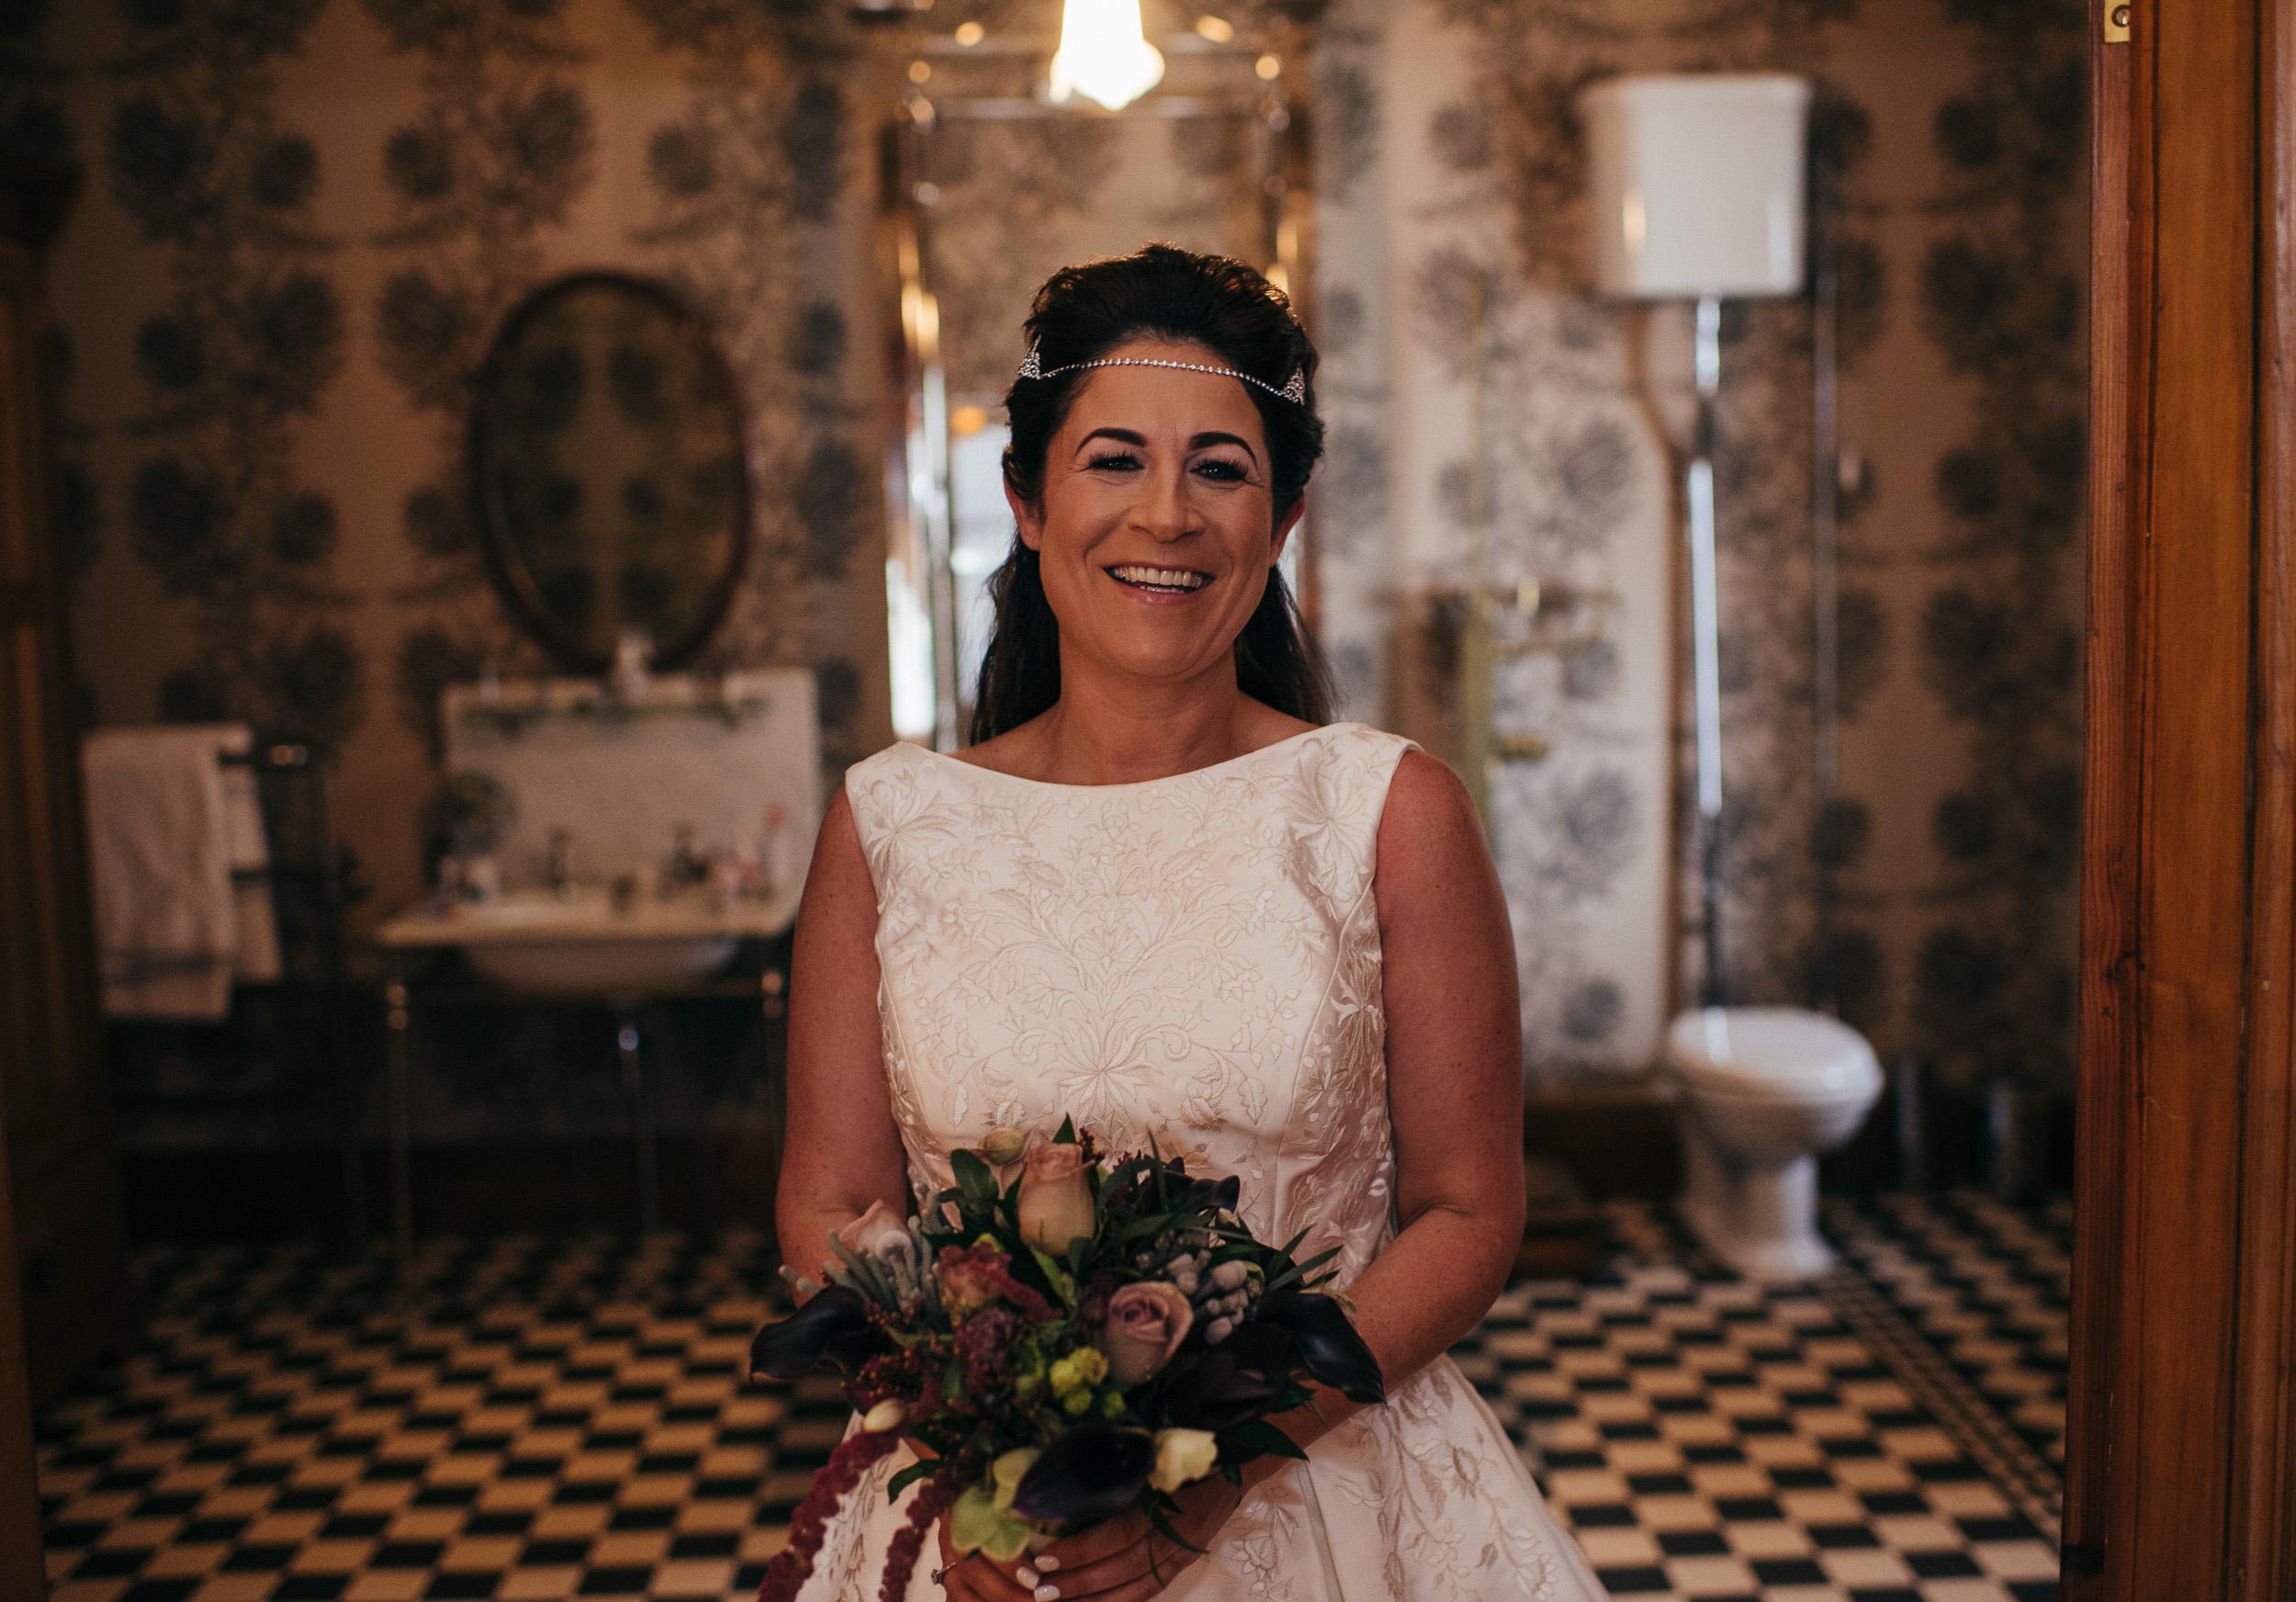 Bride in dress before wedding